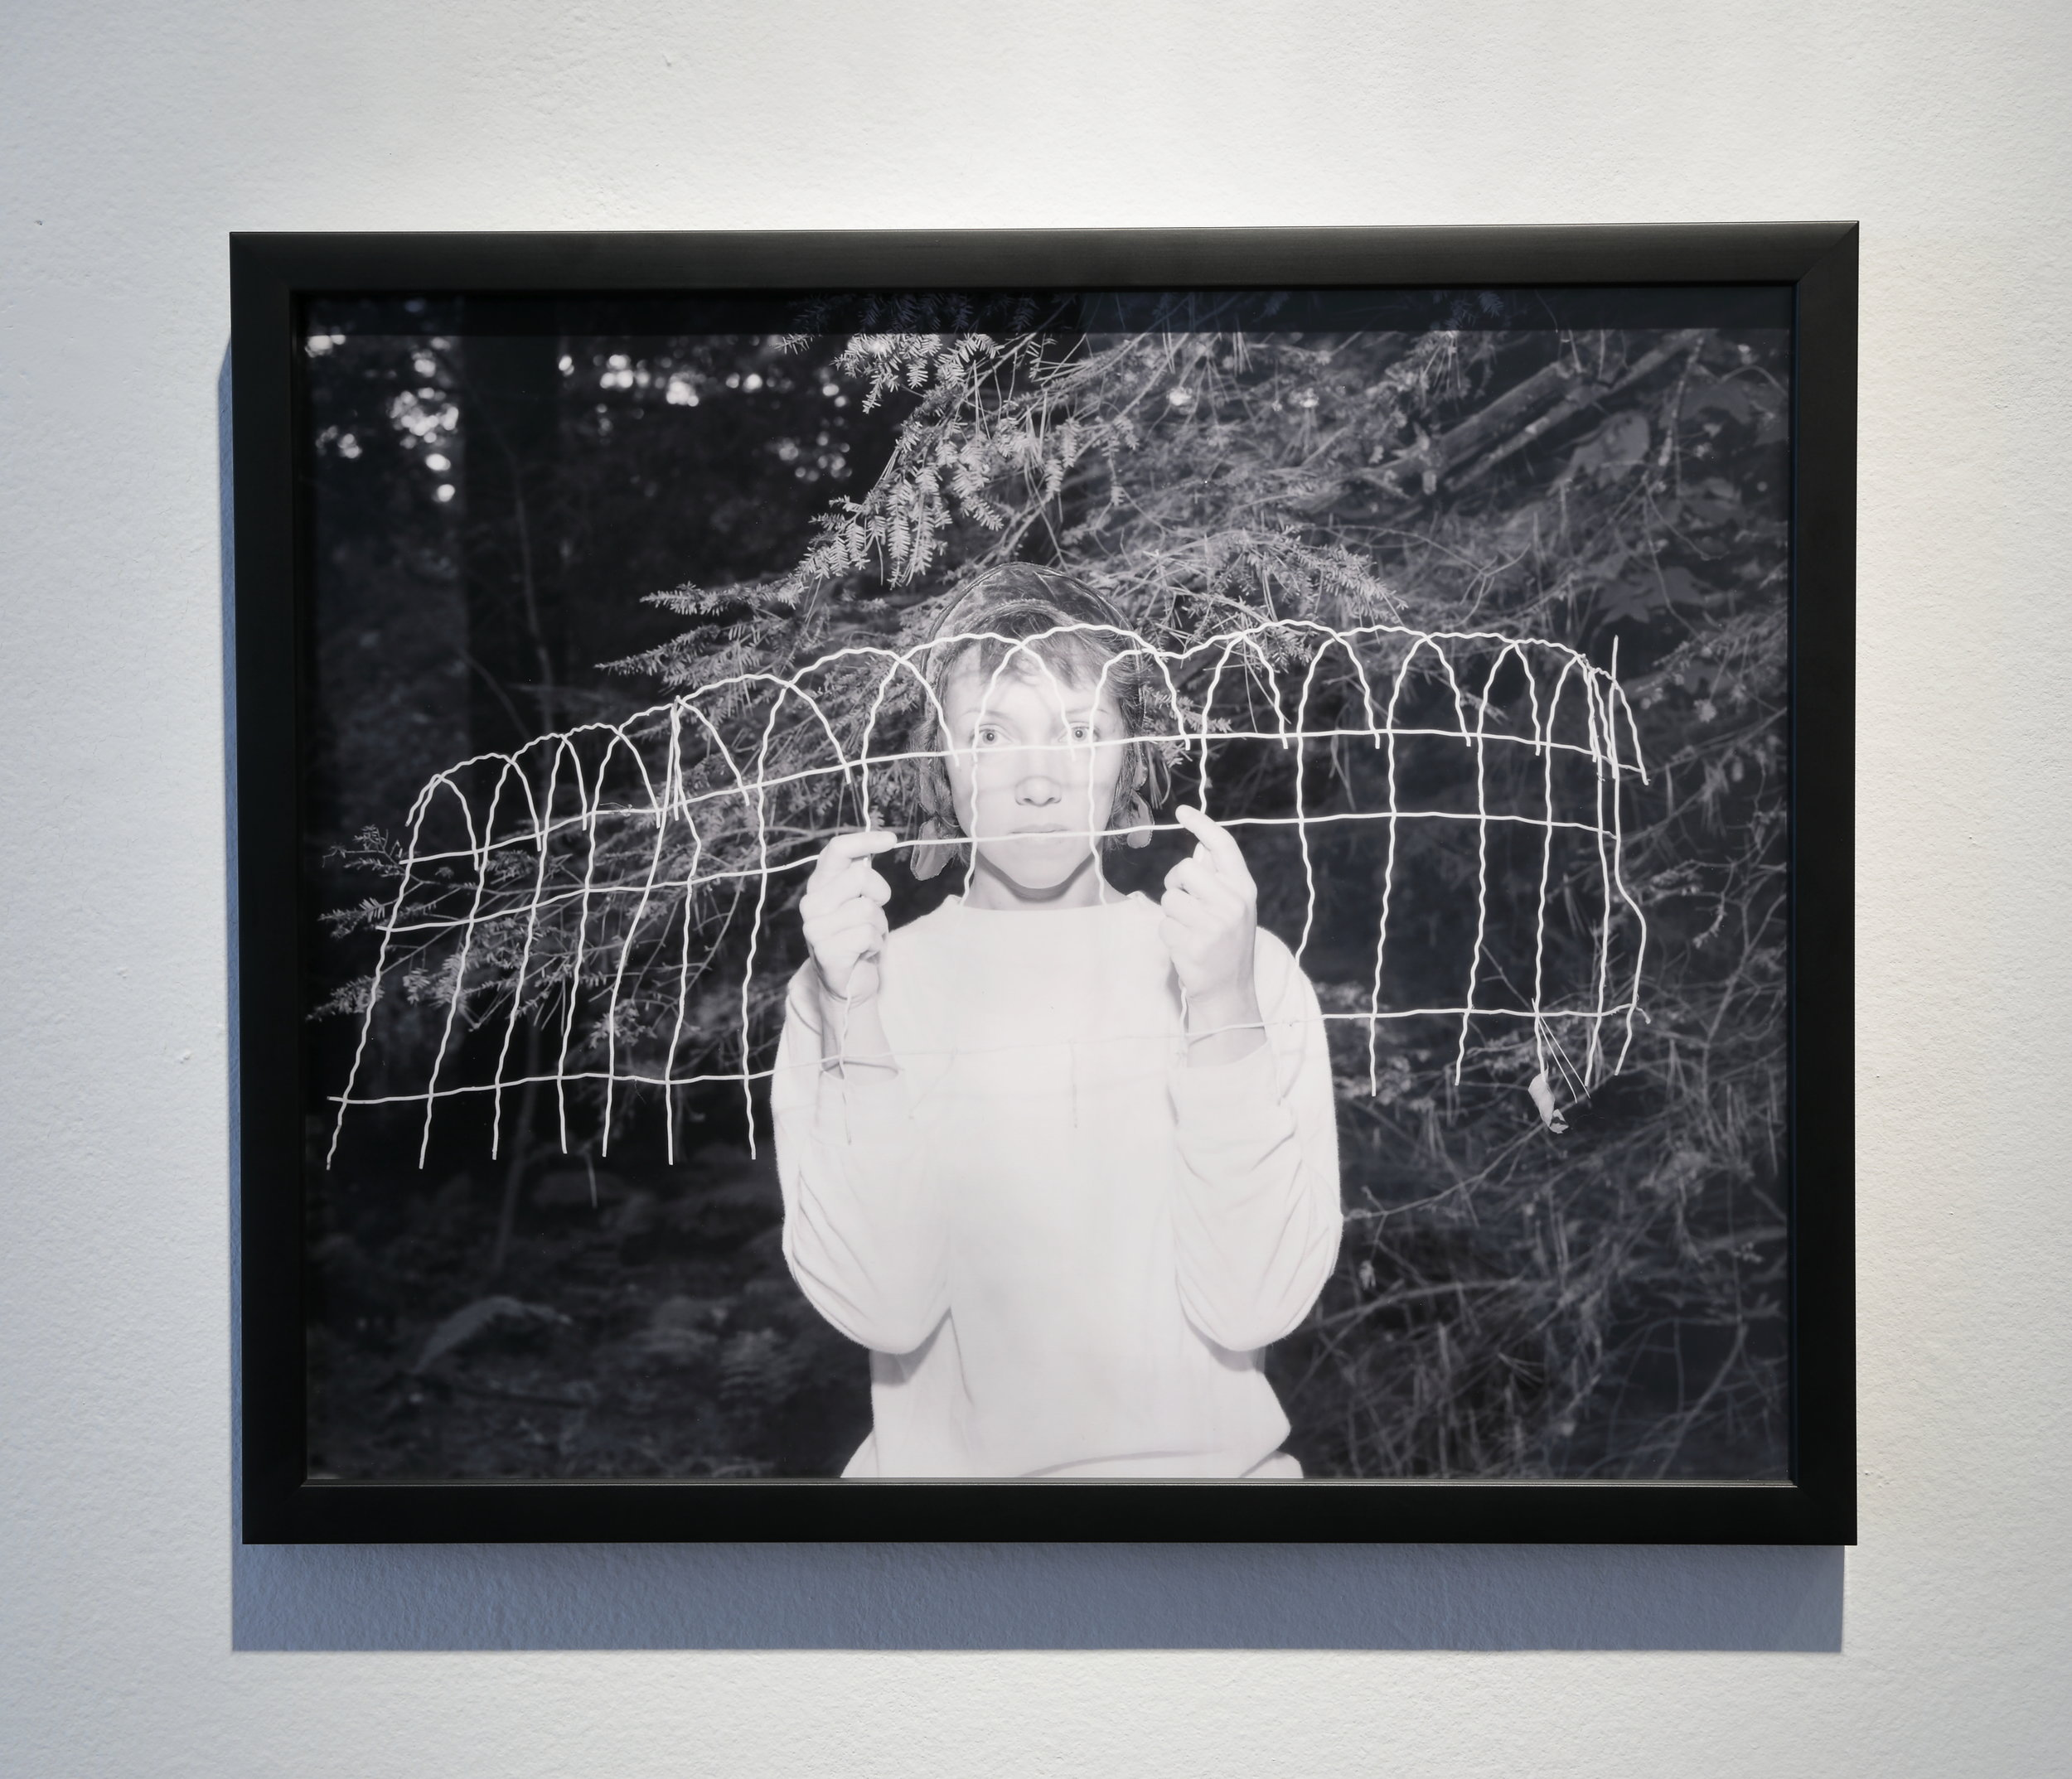 Cindy Neuschwander,   Untitled, (Self Portrait – Highlands, NC) , 1986  Photograph, Ed. of 3 + 1 exhibition copy  Courtesy of Jay Barrows, photo by David Hunter Hale